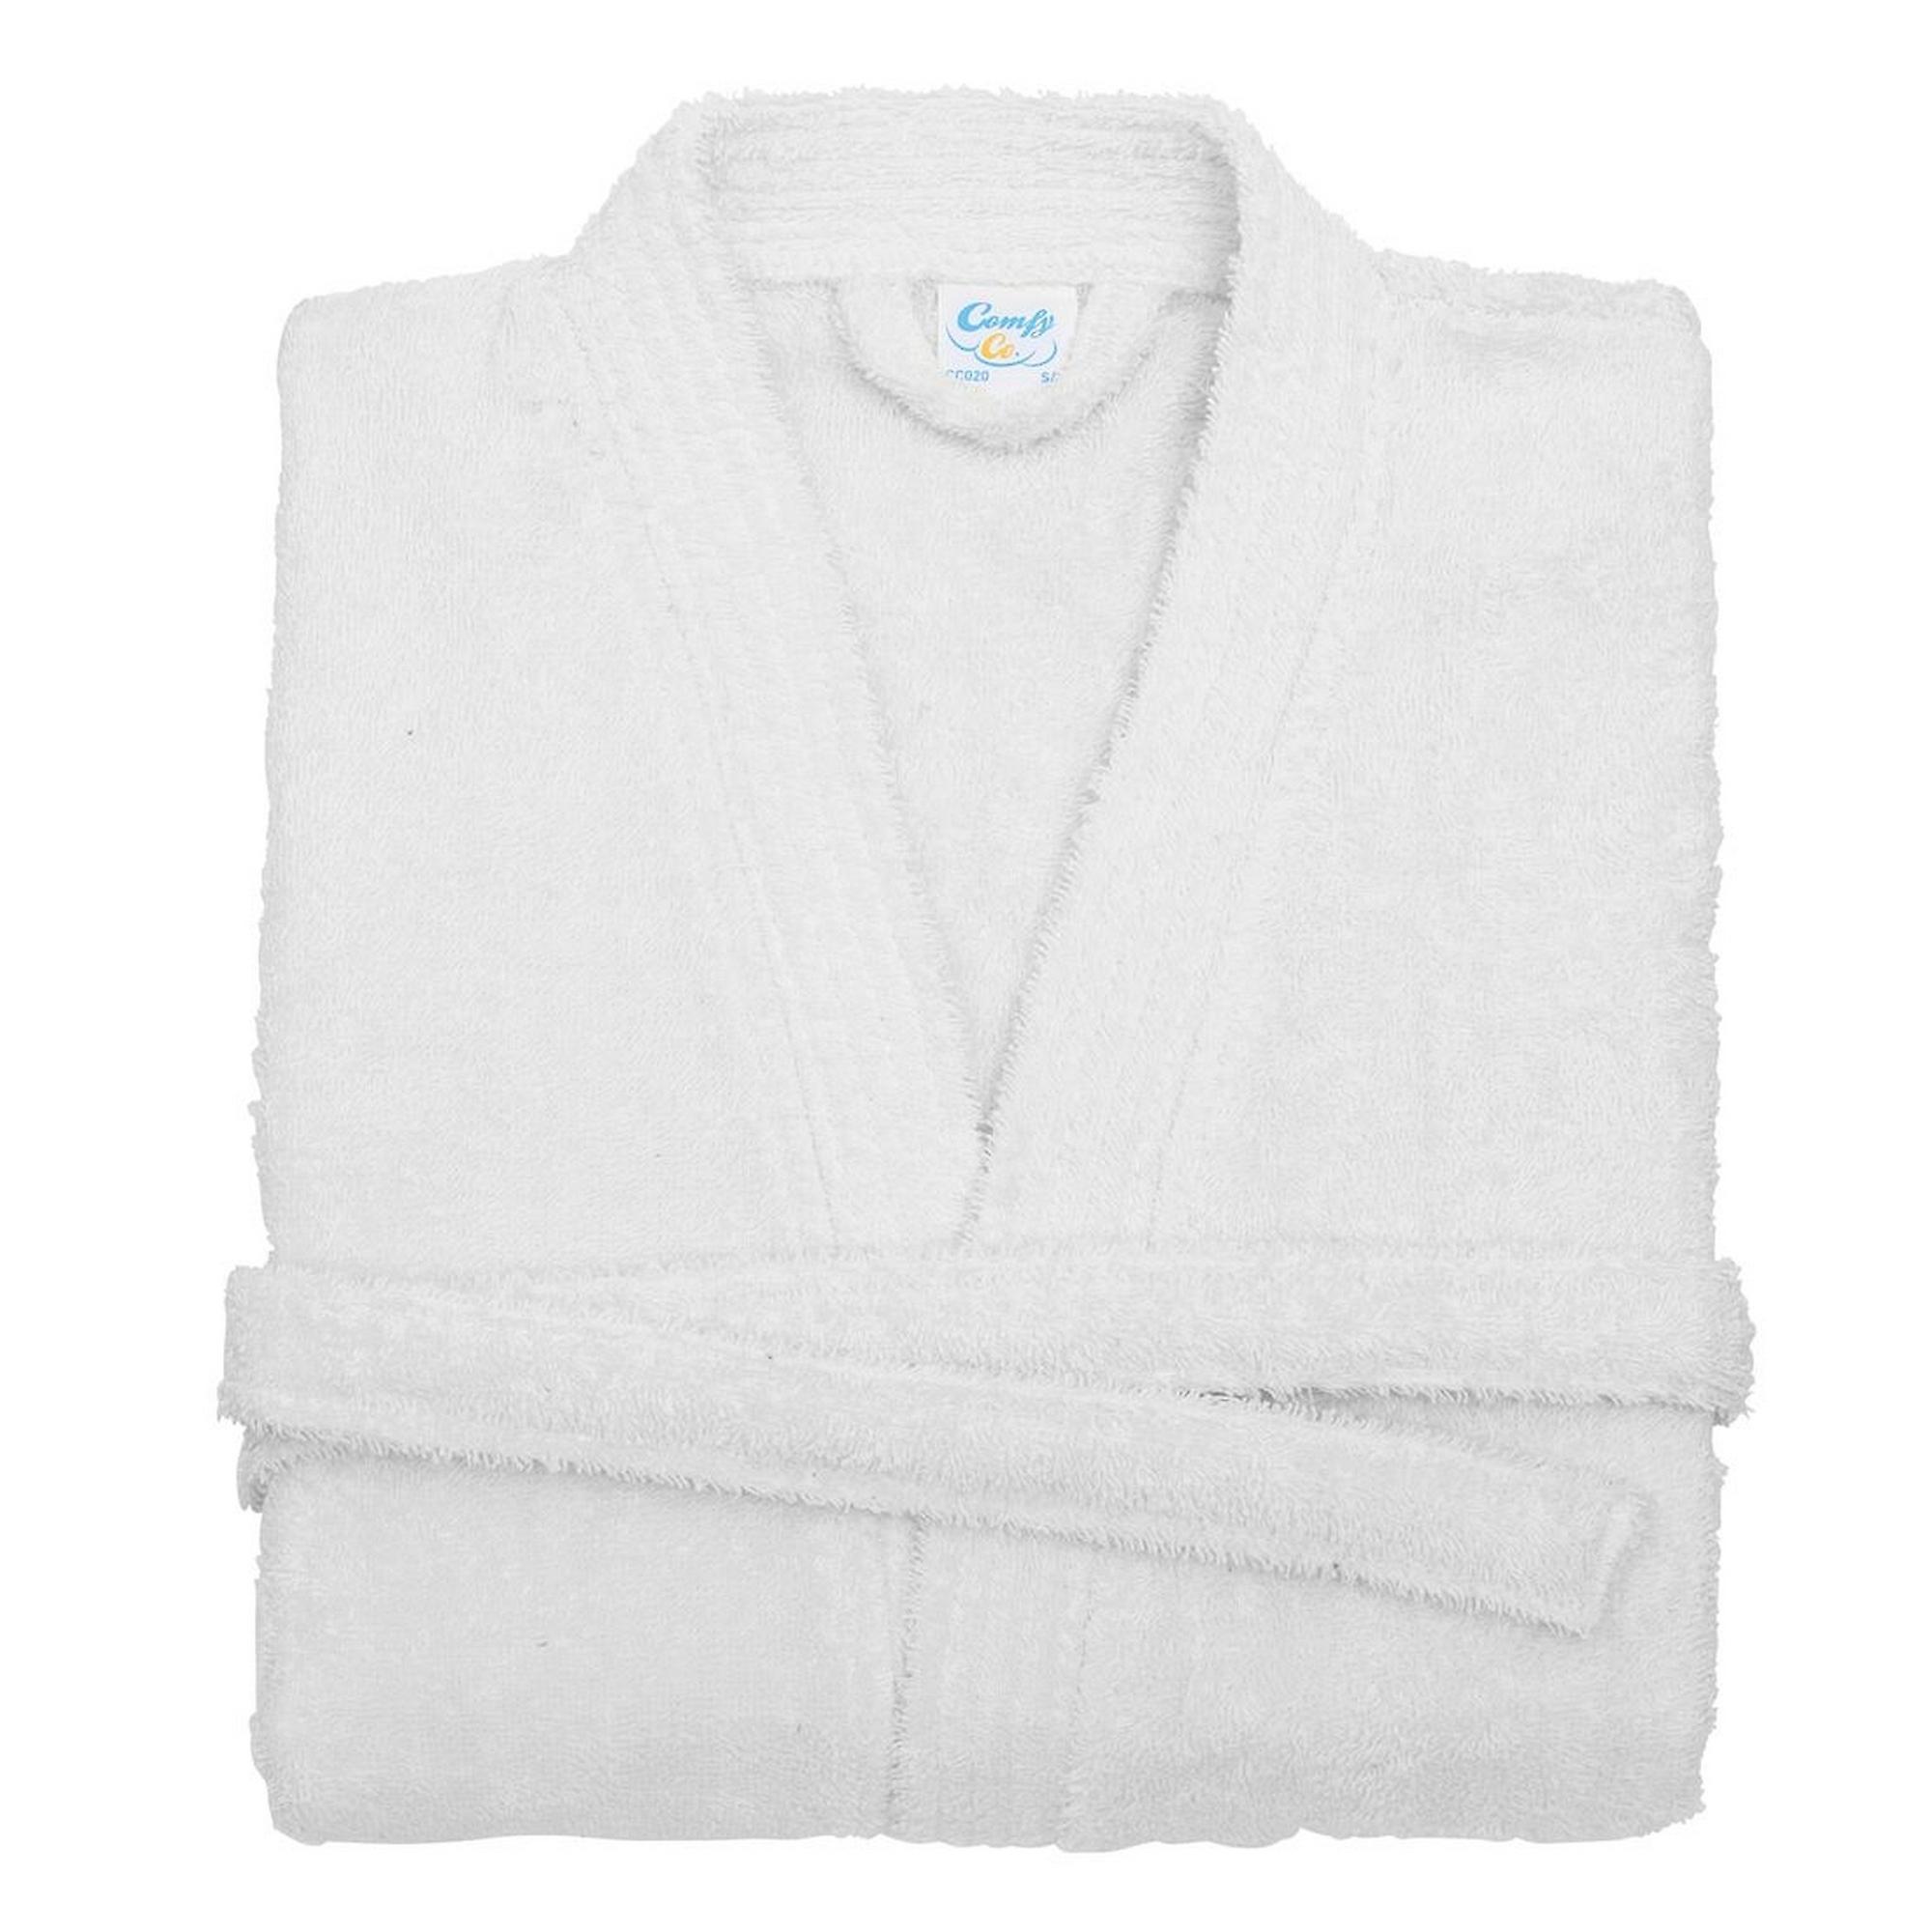 Comfy Co Childrens/Kids Robe